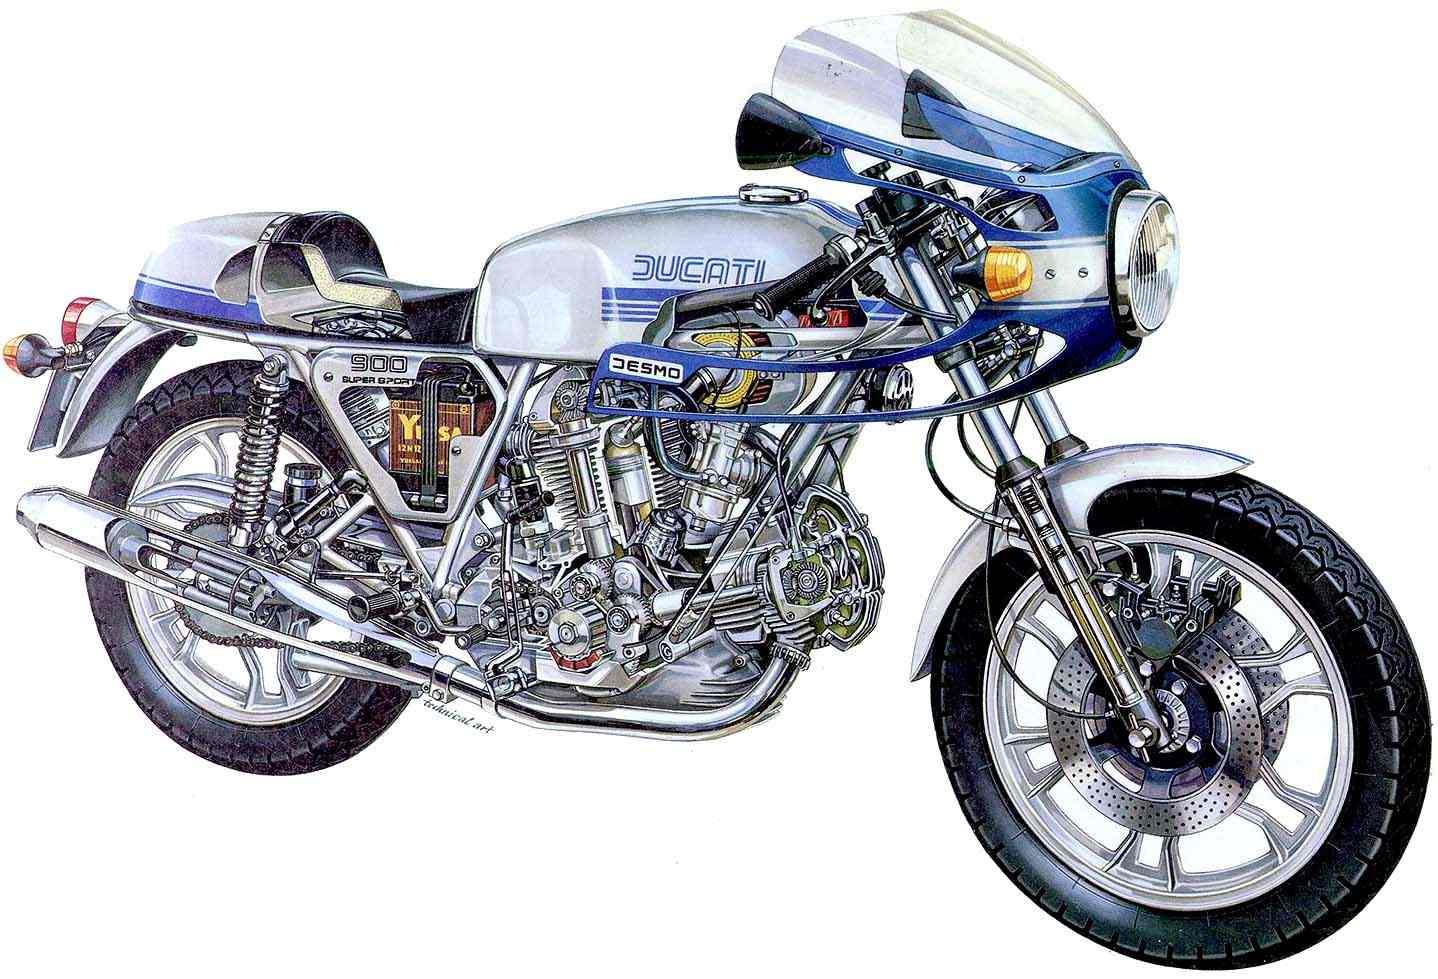 Ducati 900ss Cutaway Ducati 900ss Cutaway